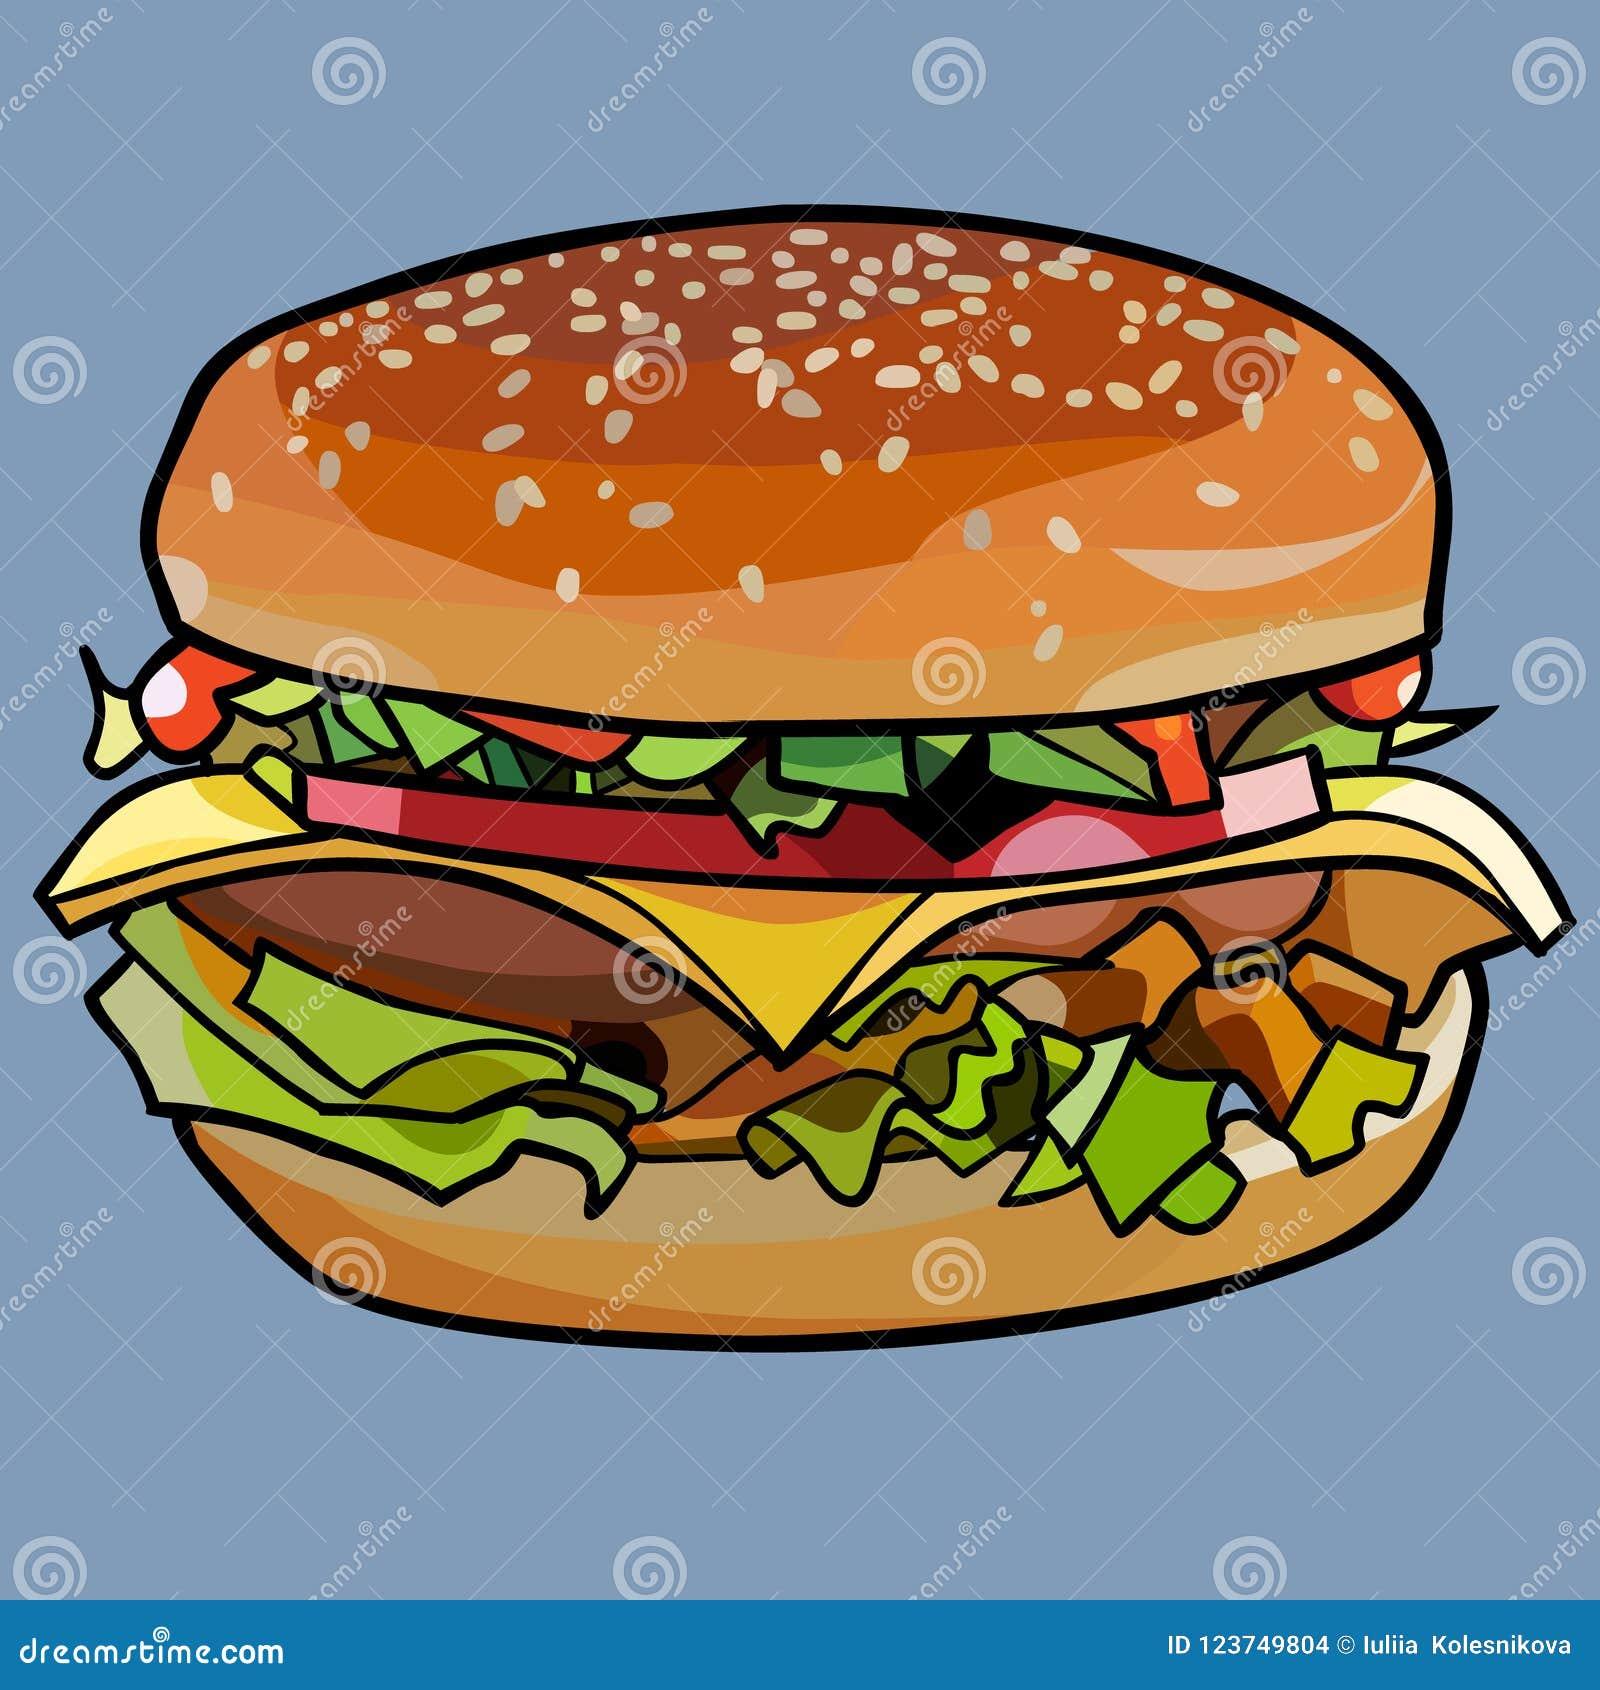 Cheeseburger tirado desenhos animados, sanduíche com queijo e carne e vegetais